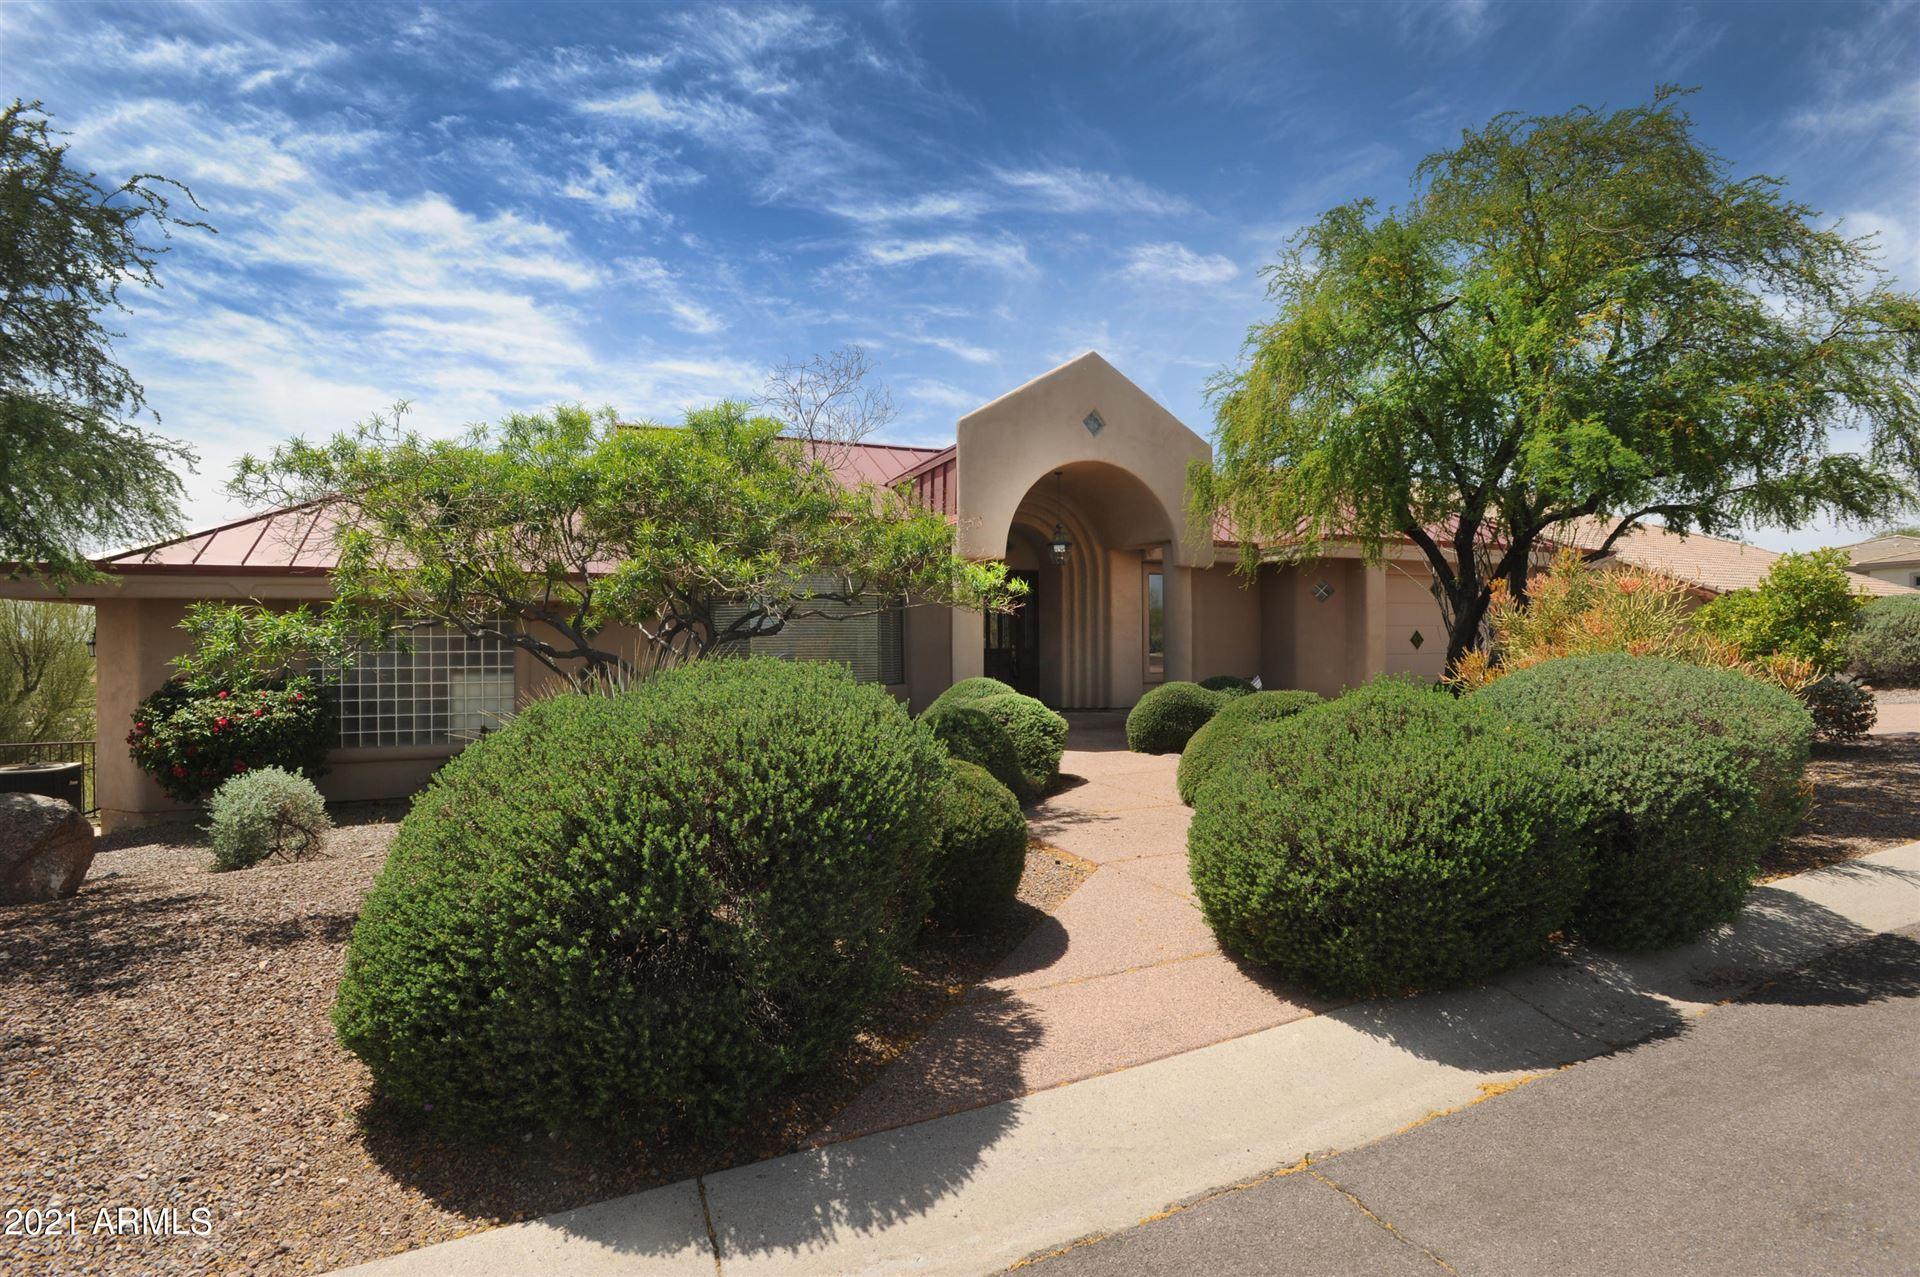 Photo of 15643 E CENTIPEDE Drive, Fountain Hills, AZ 85268 (MLS # 6269787)